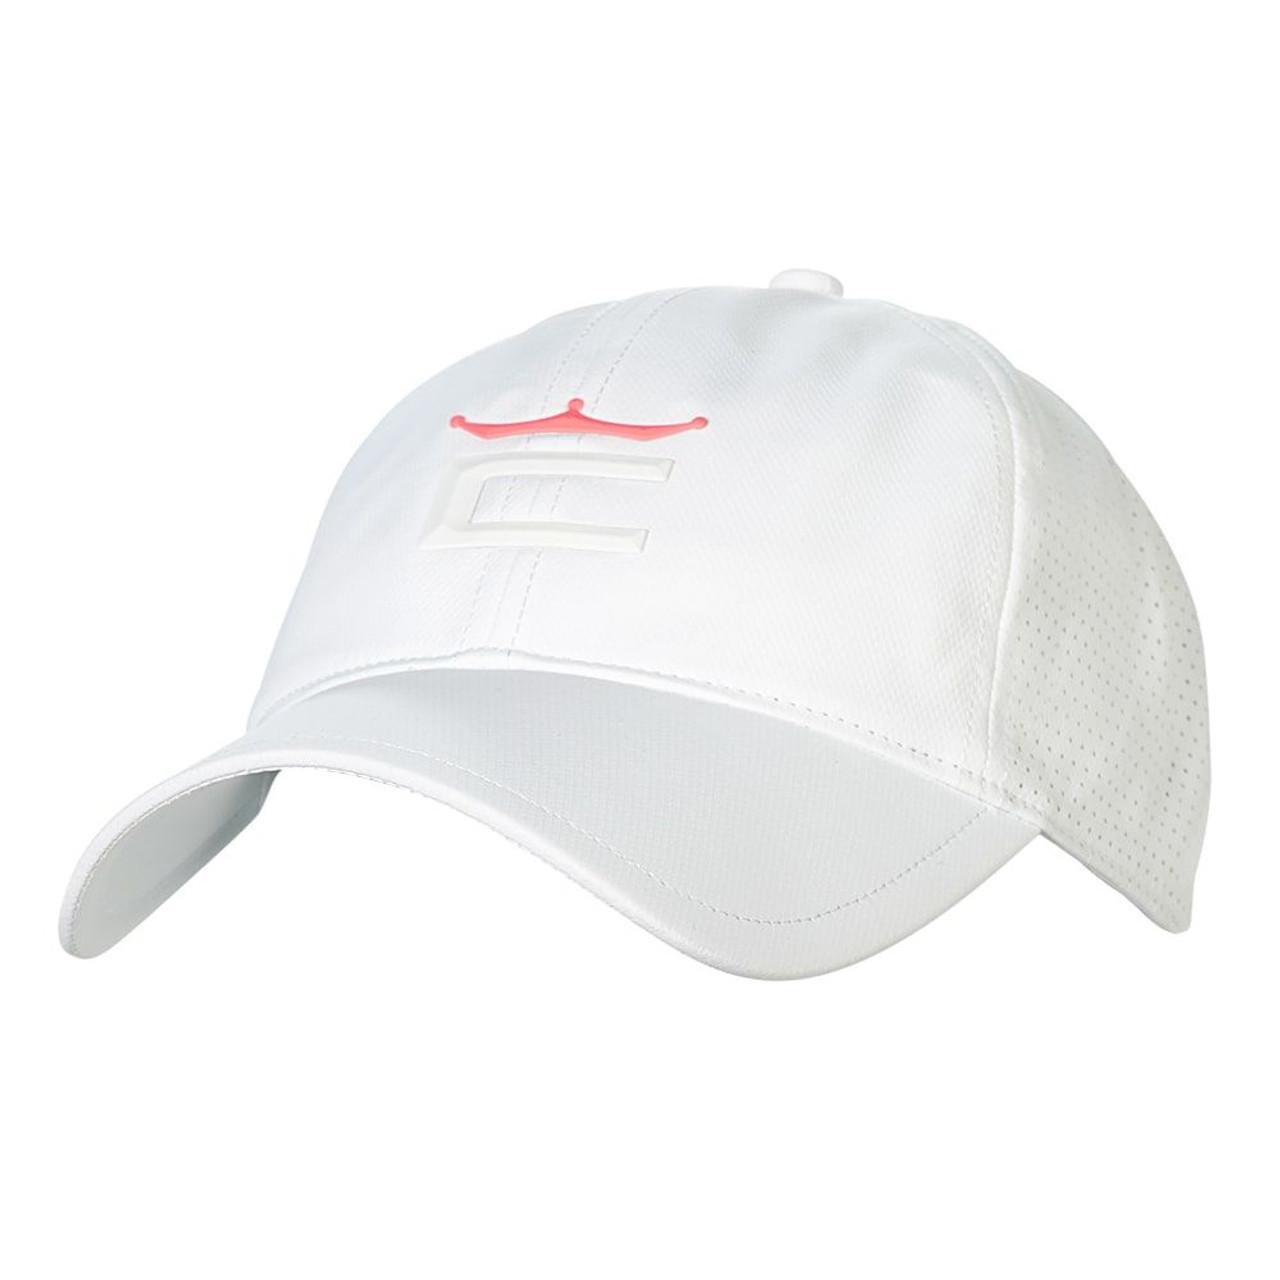 Cobra Women Crown Adjustable Golf Cap - Bright White